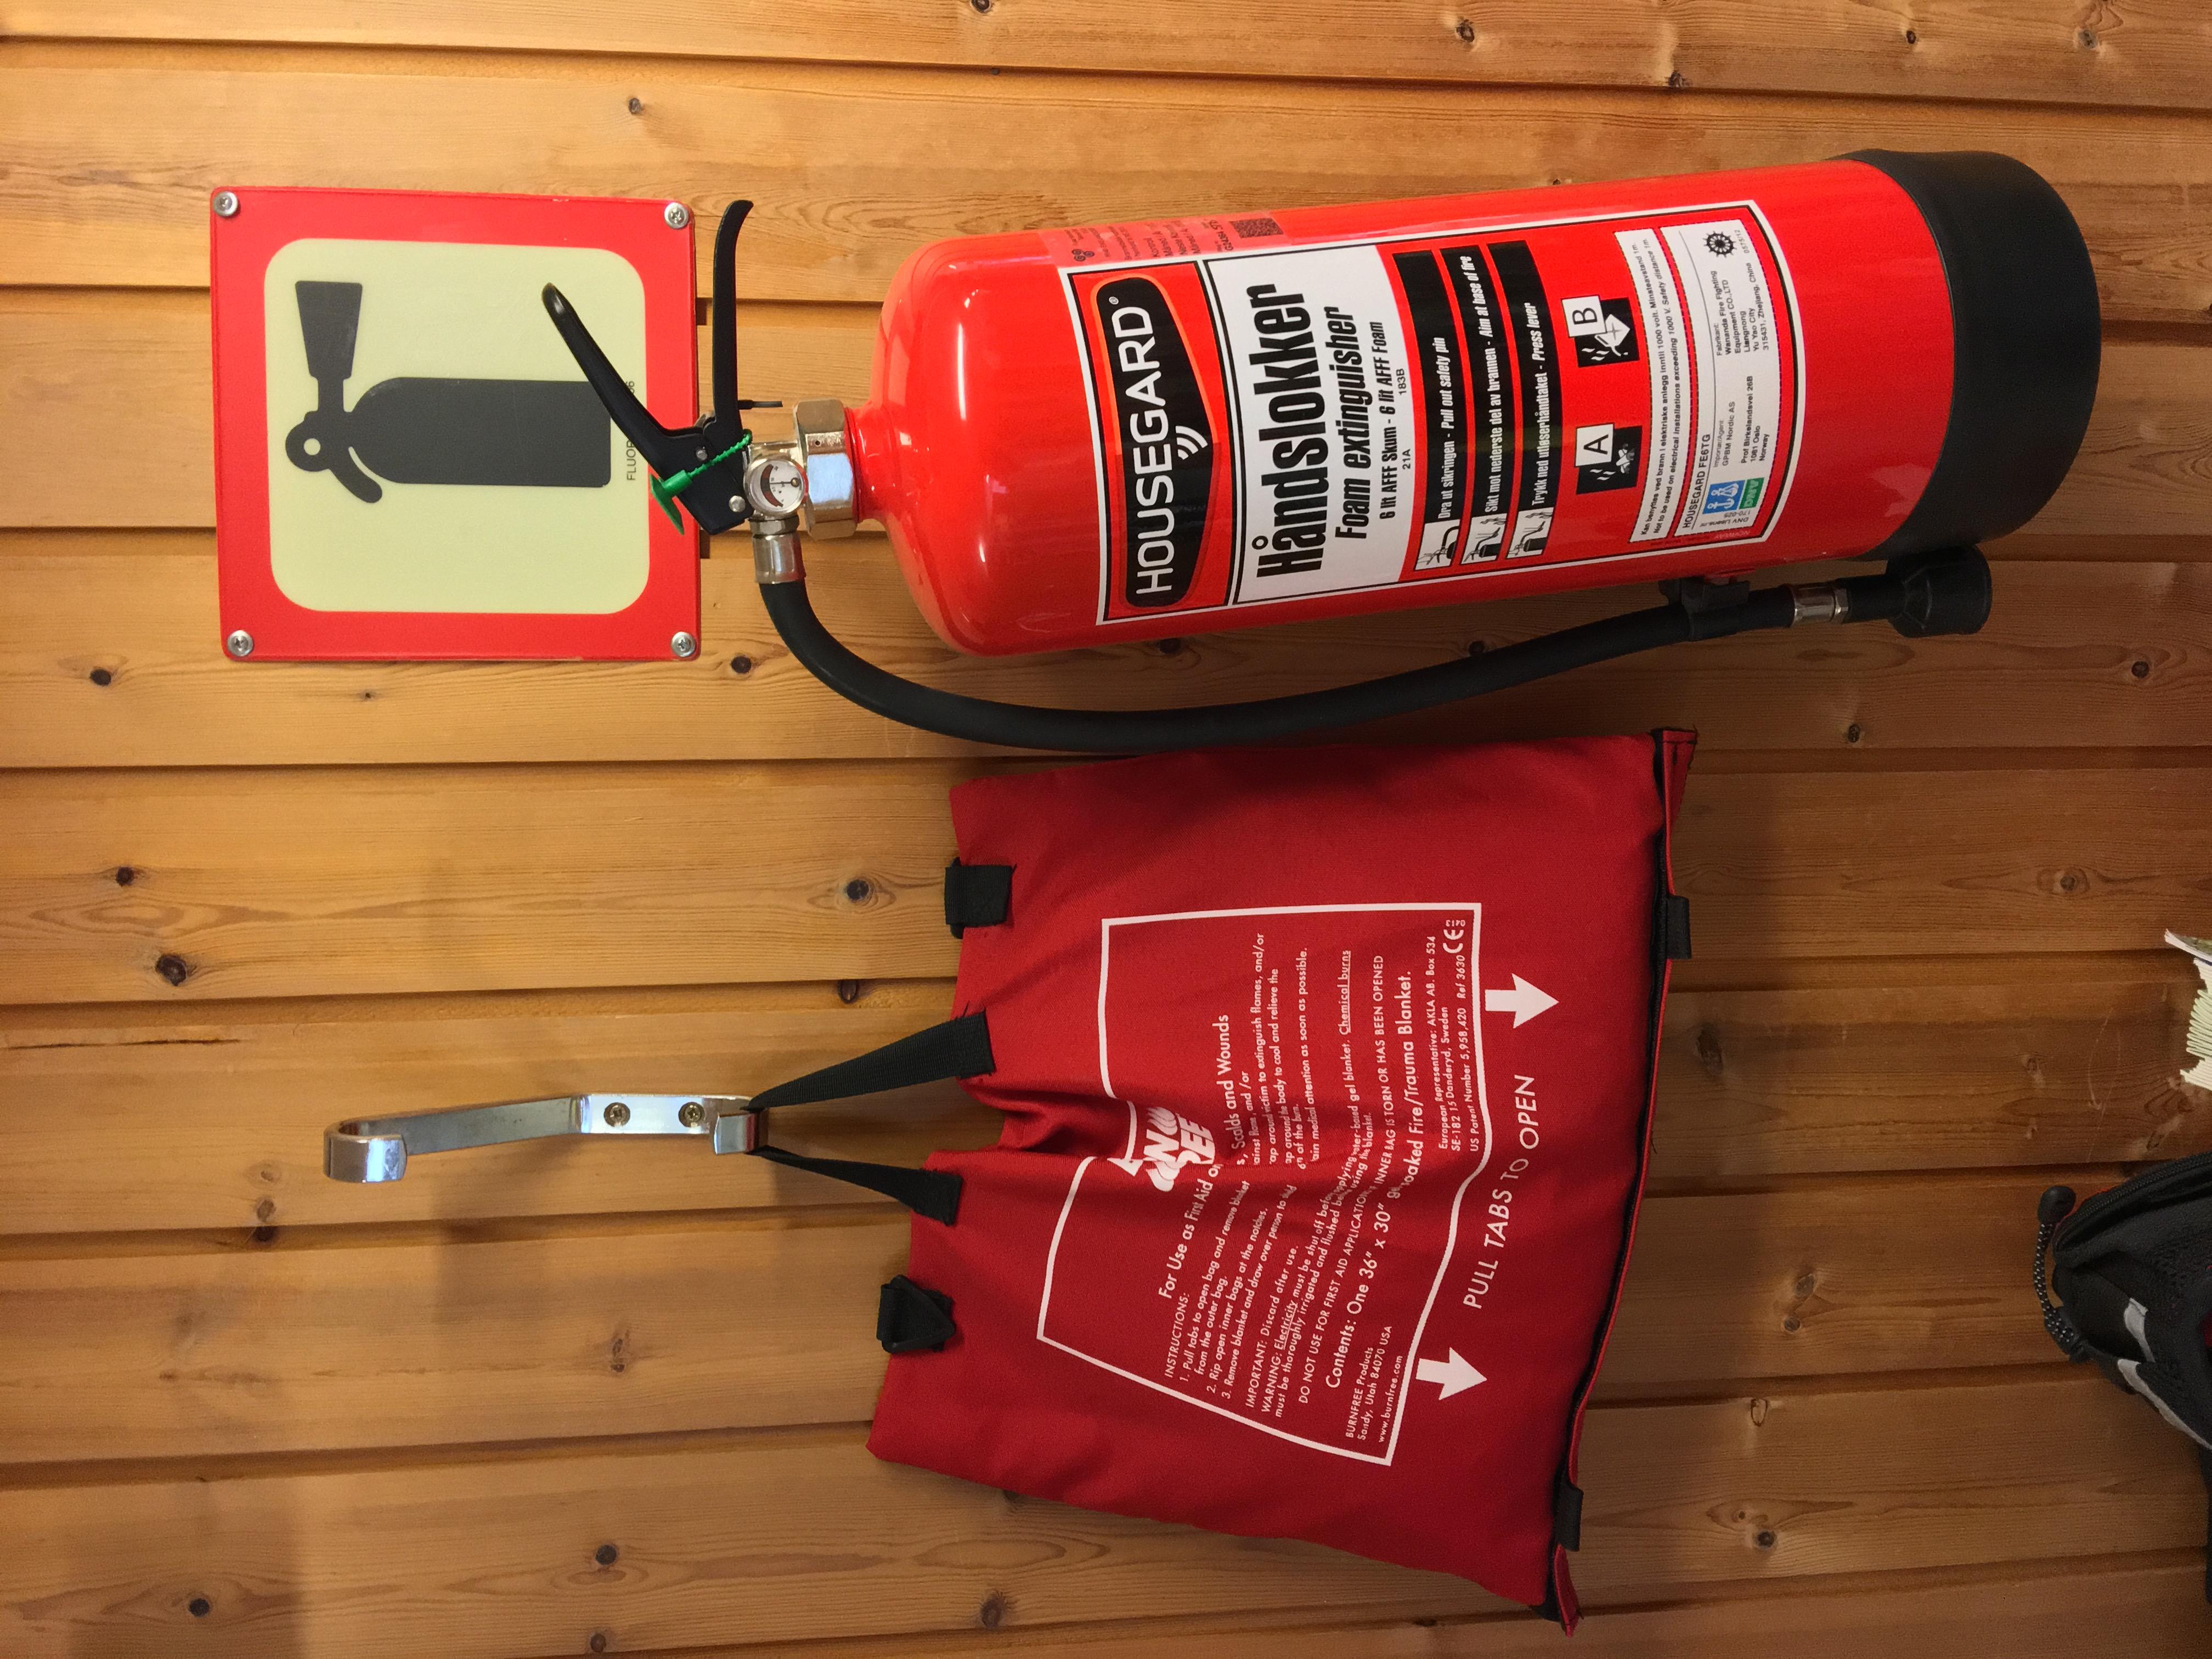 File:Fire foam extinguisher (håndslokker, brannslukningsapparat,  pulverapparat, skumapparat, type HOUSEGARD) on wall in primary school in  Eikelandsosen, Fusa, Hordaland, Norway. Also sign and fire blanket.  2018-03-23 C.jpg - Wikimedia Commons